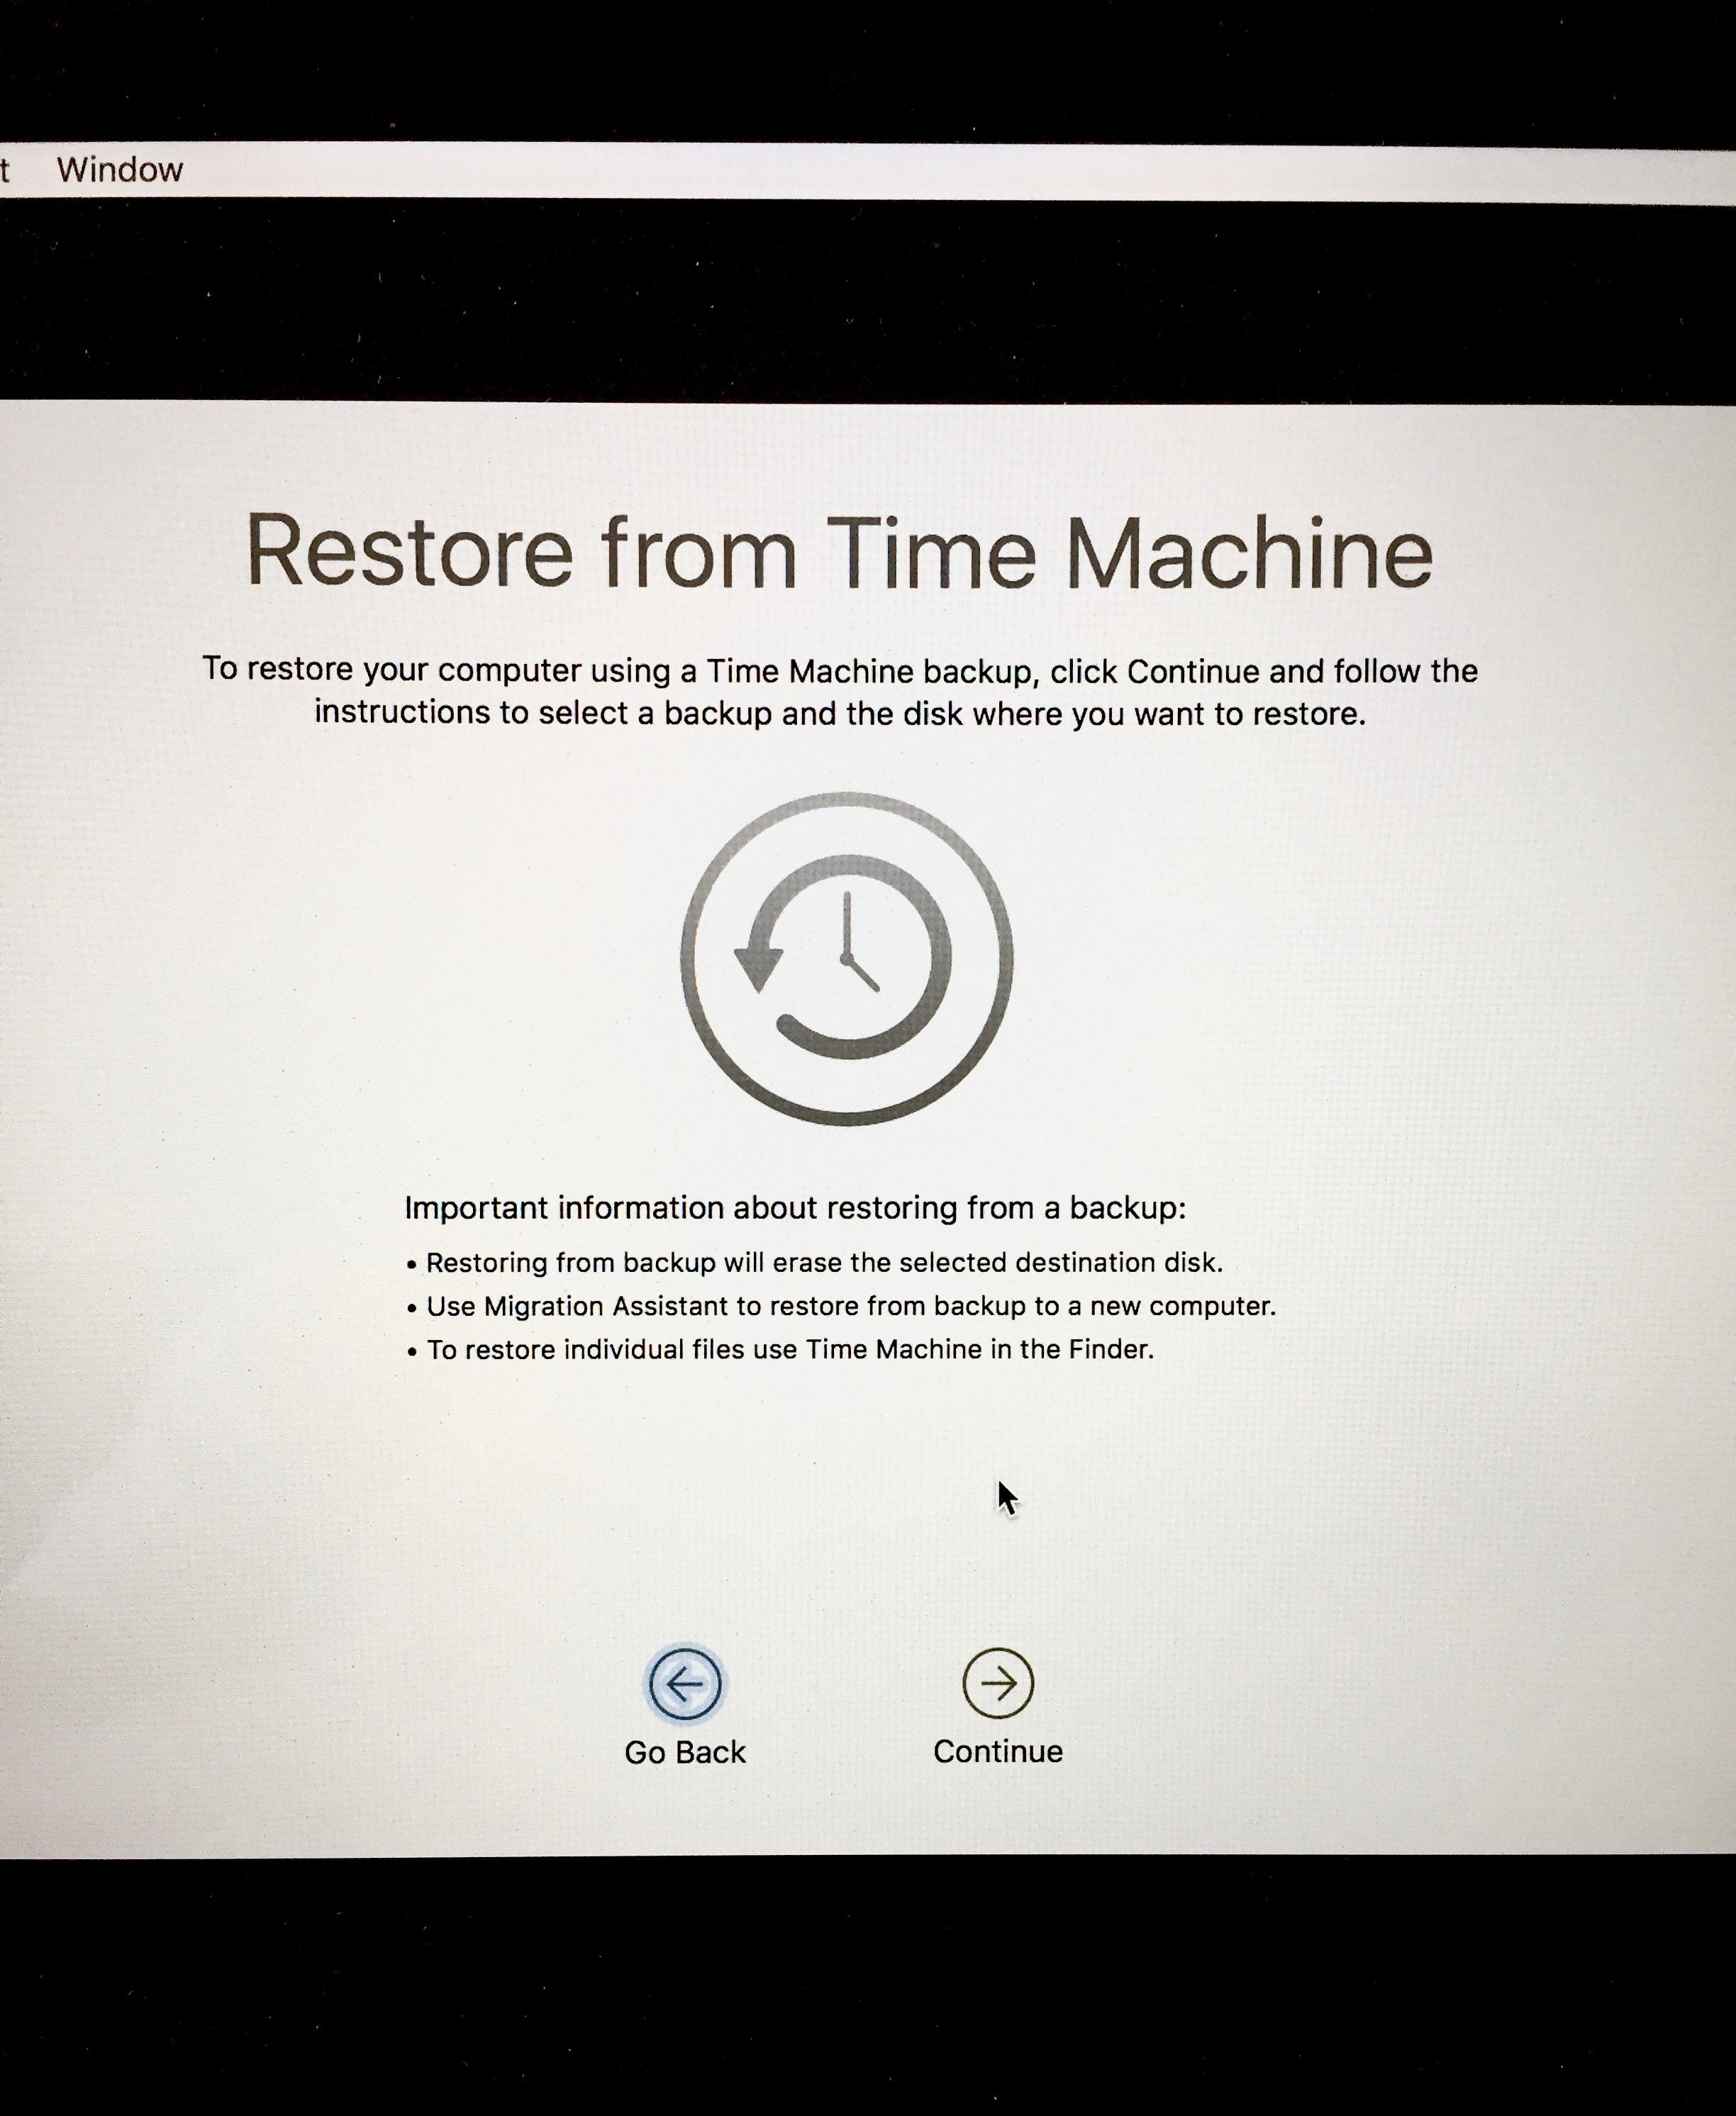 Time Machine Restore Backup